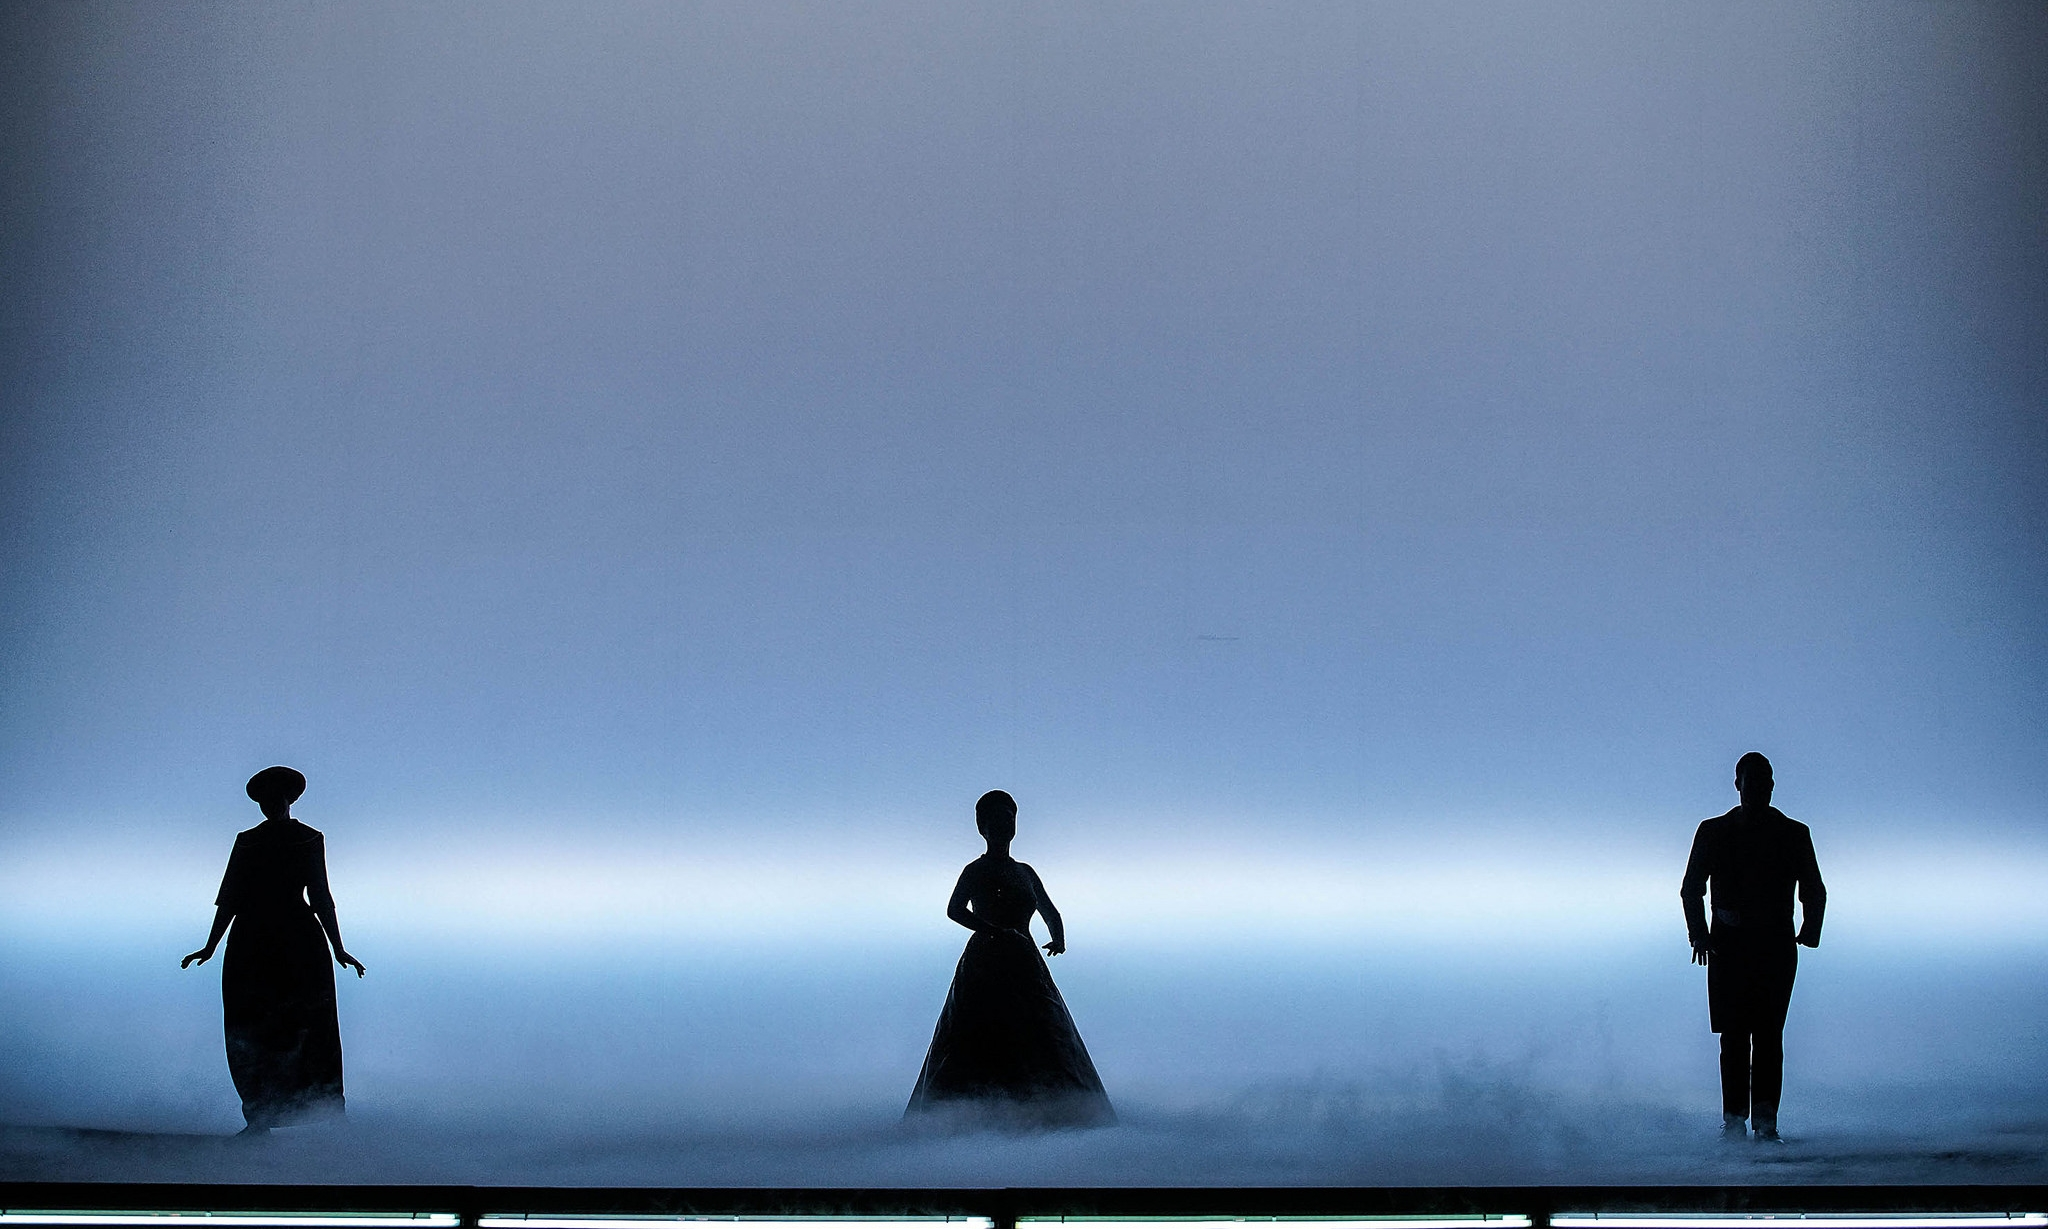 Act 1 - Kerstin Eder (Annina), Myung Joo Lee (Violetta Valéry), Dominik Nekel (Doctor Grenvil). Linz, 2015